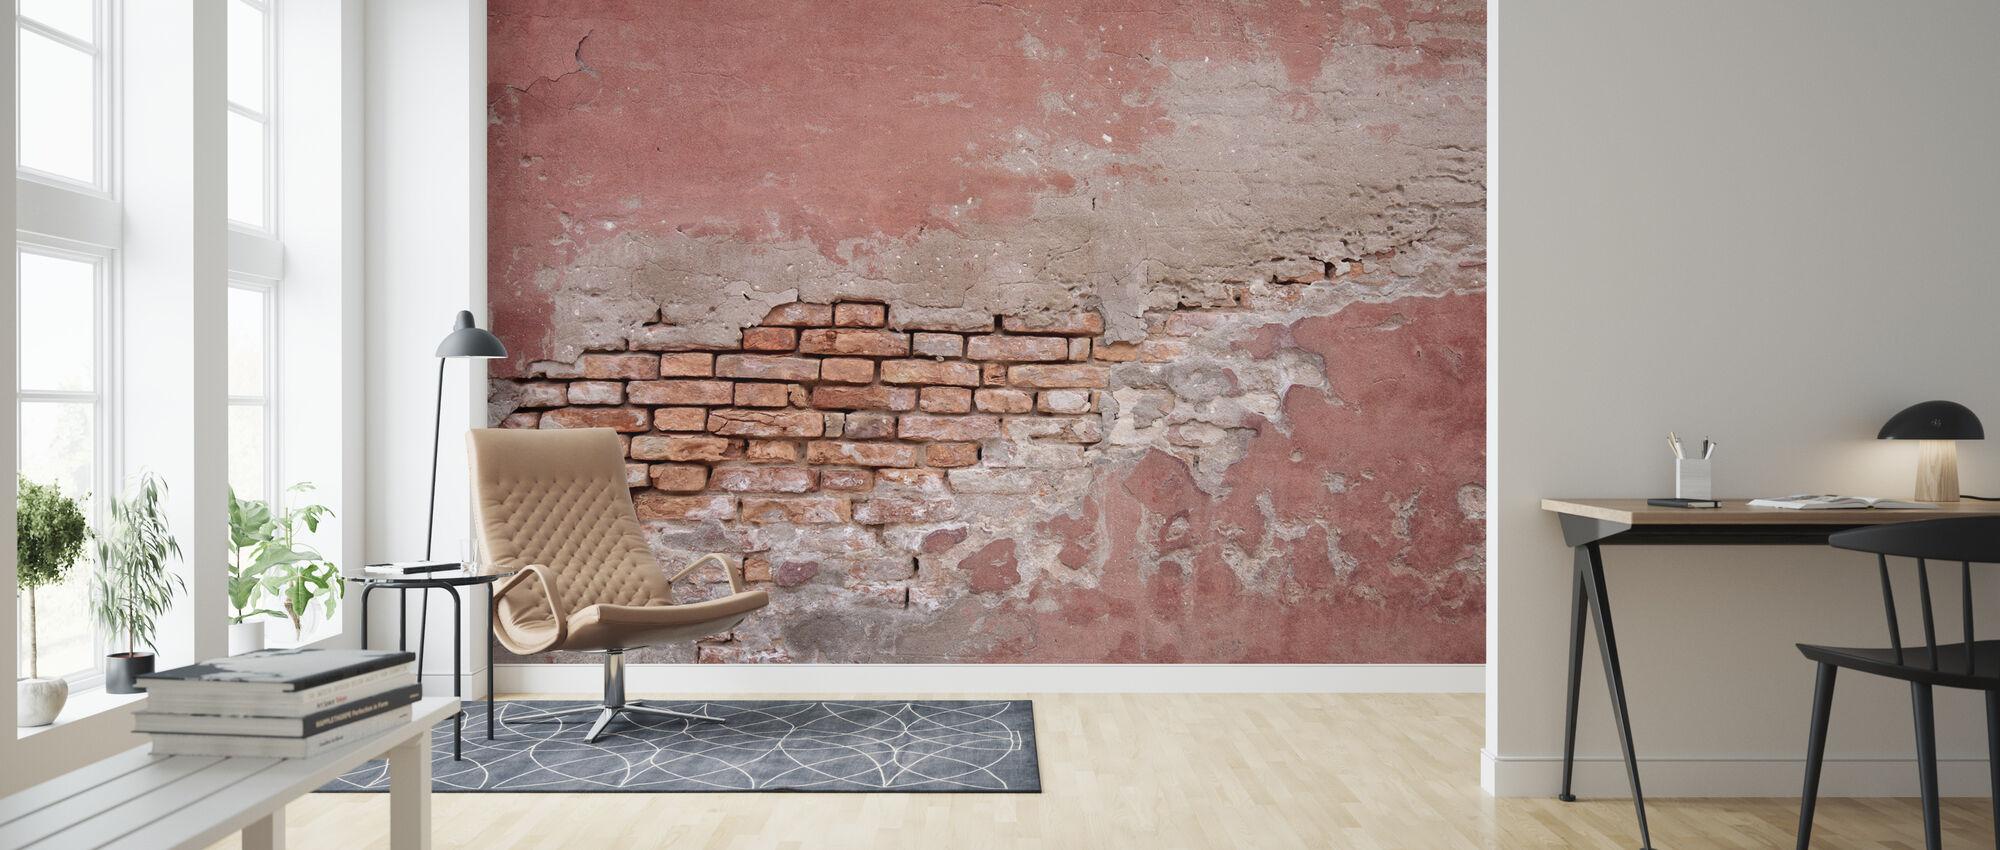 Pink Colored Brick Wall - Wallpaper - Living Room